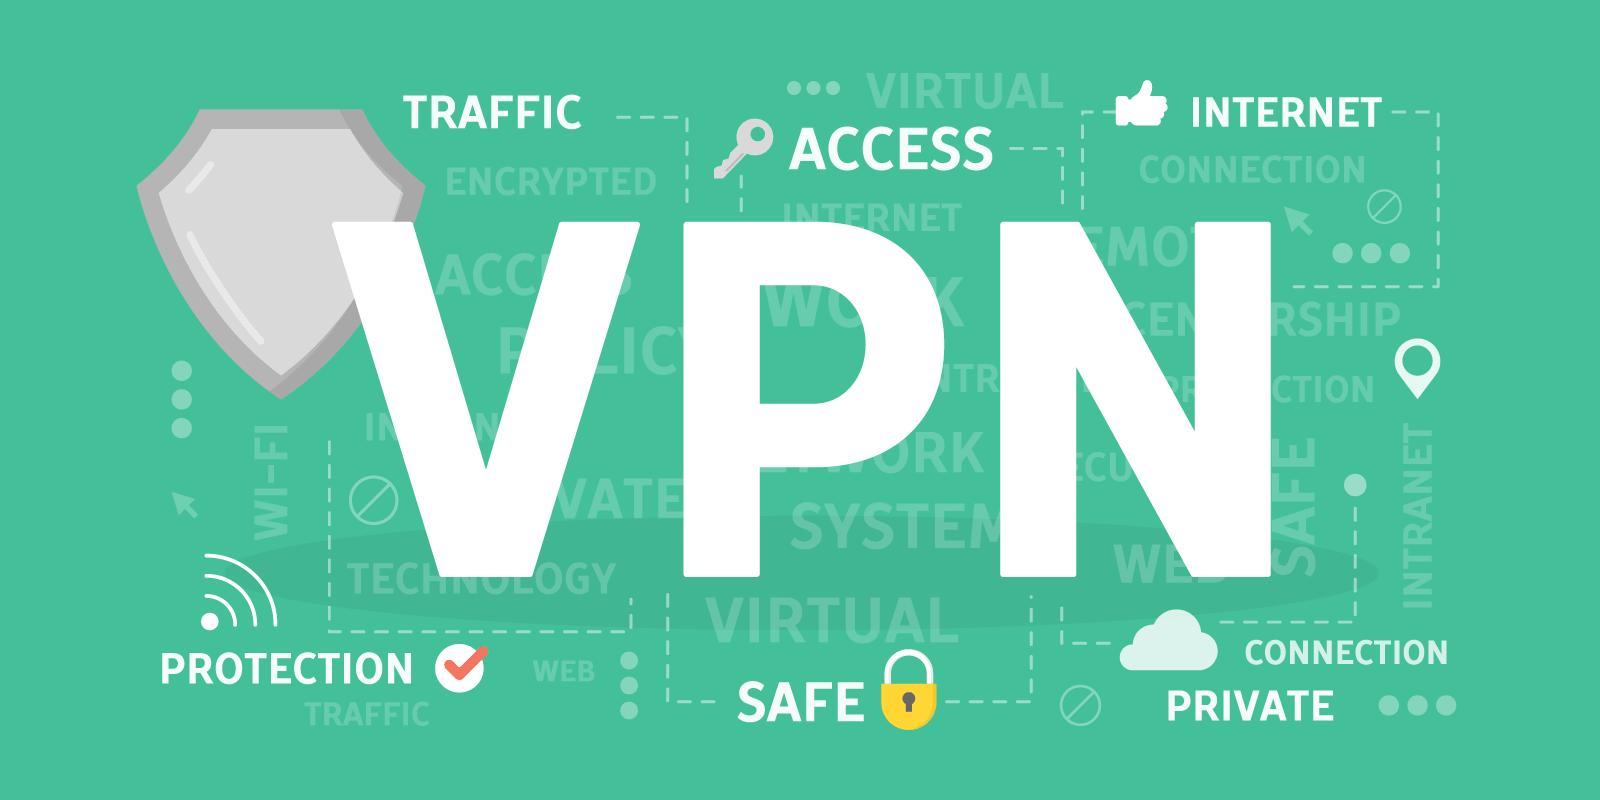 VPN sicura e affidabile con i consigli di Panda Security thumbnail